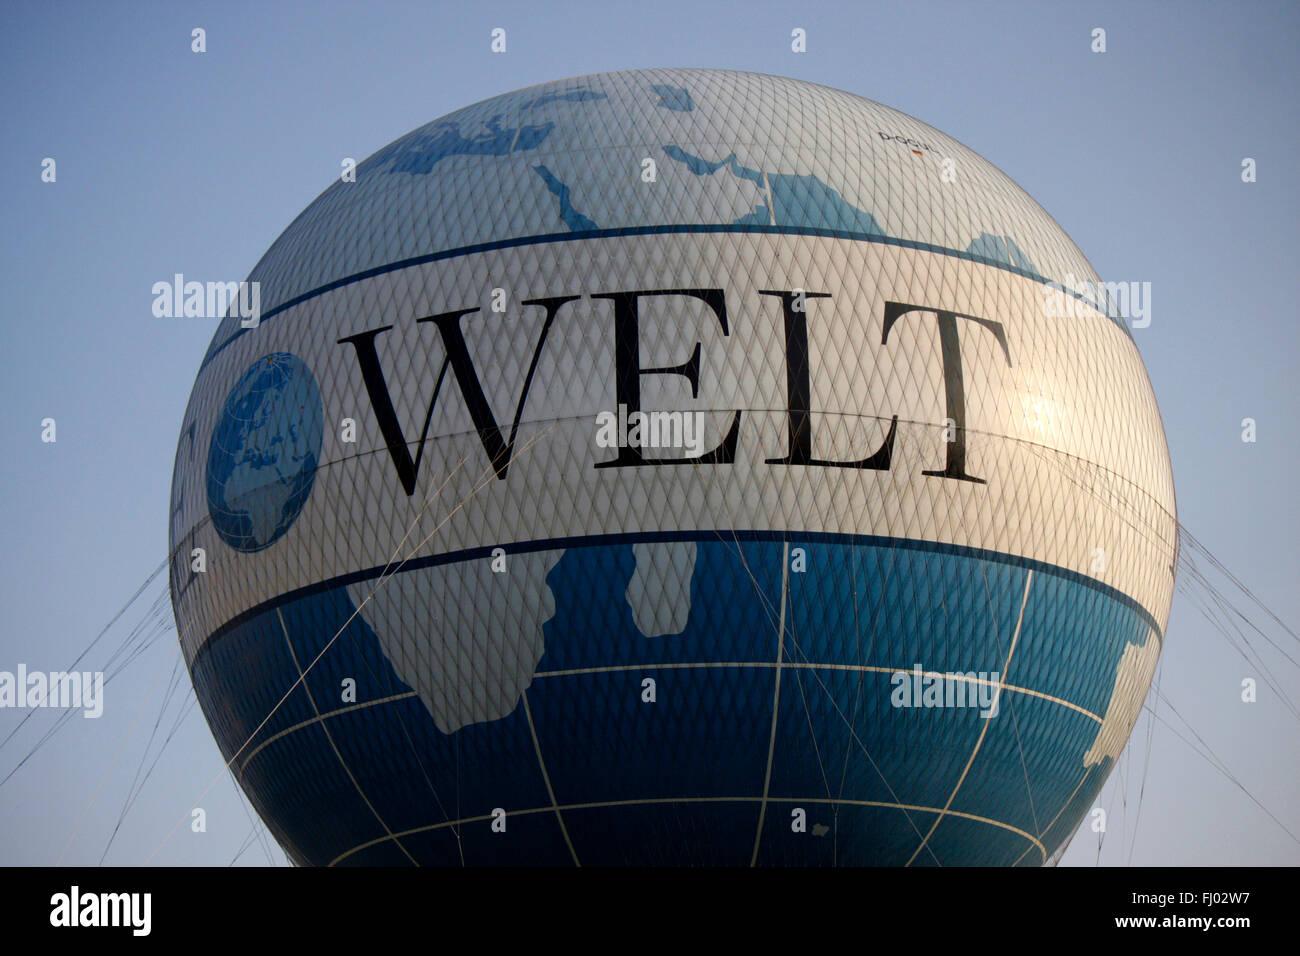 Markenname: 'die Welt', Berlin. - Stock Image